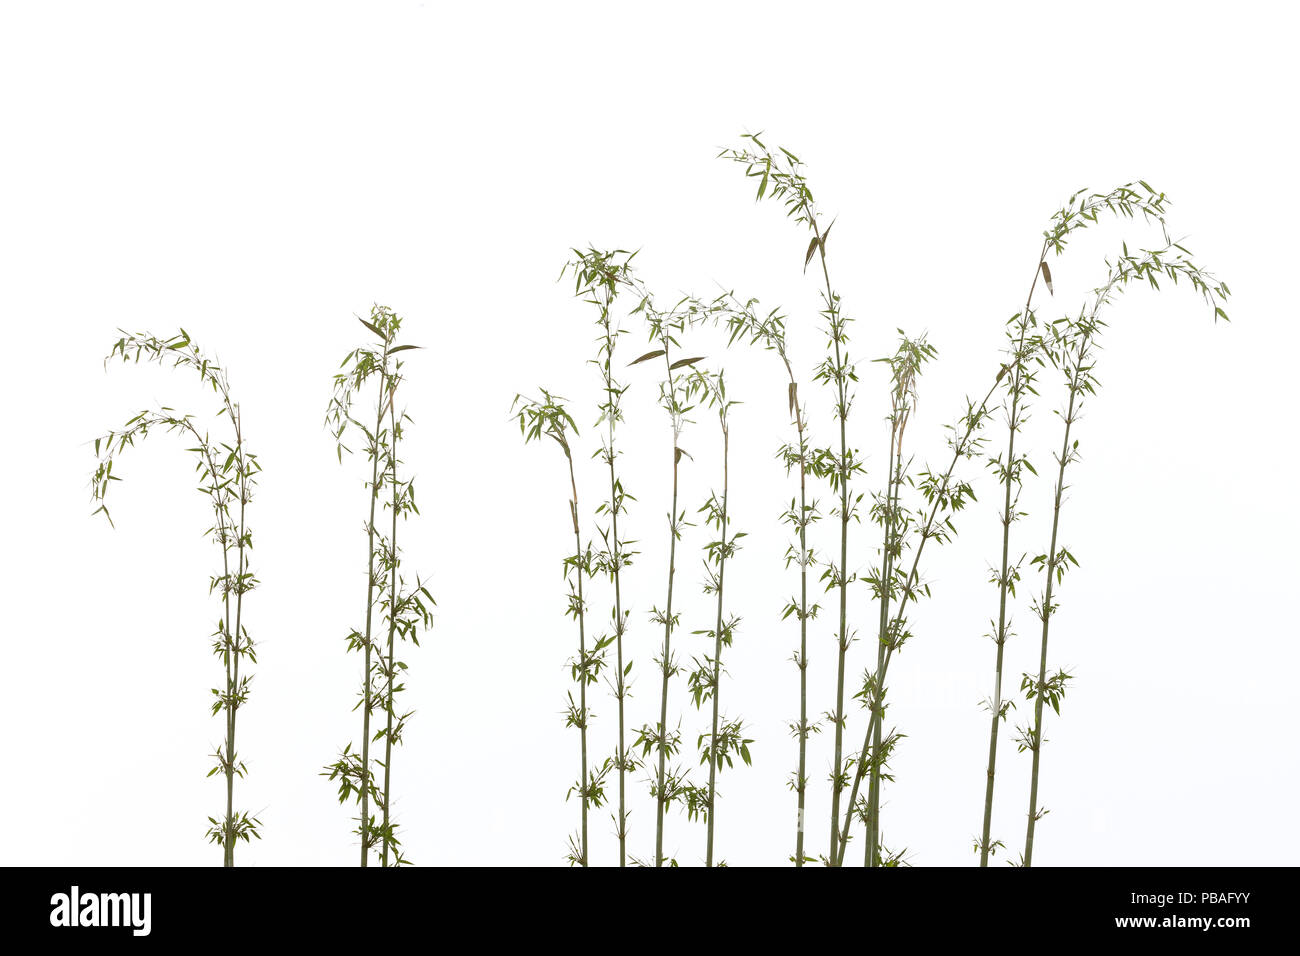 Bamboo (Fargesia sp.), Sichuan, China - Stock Image